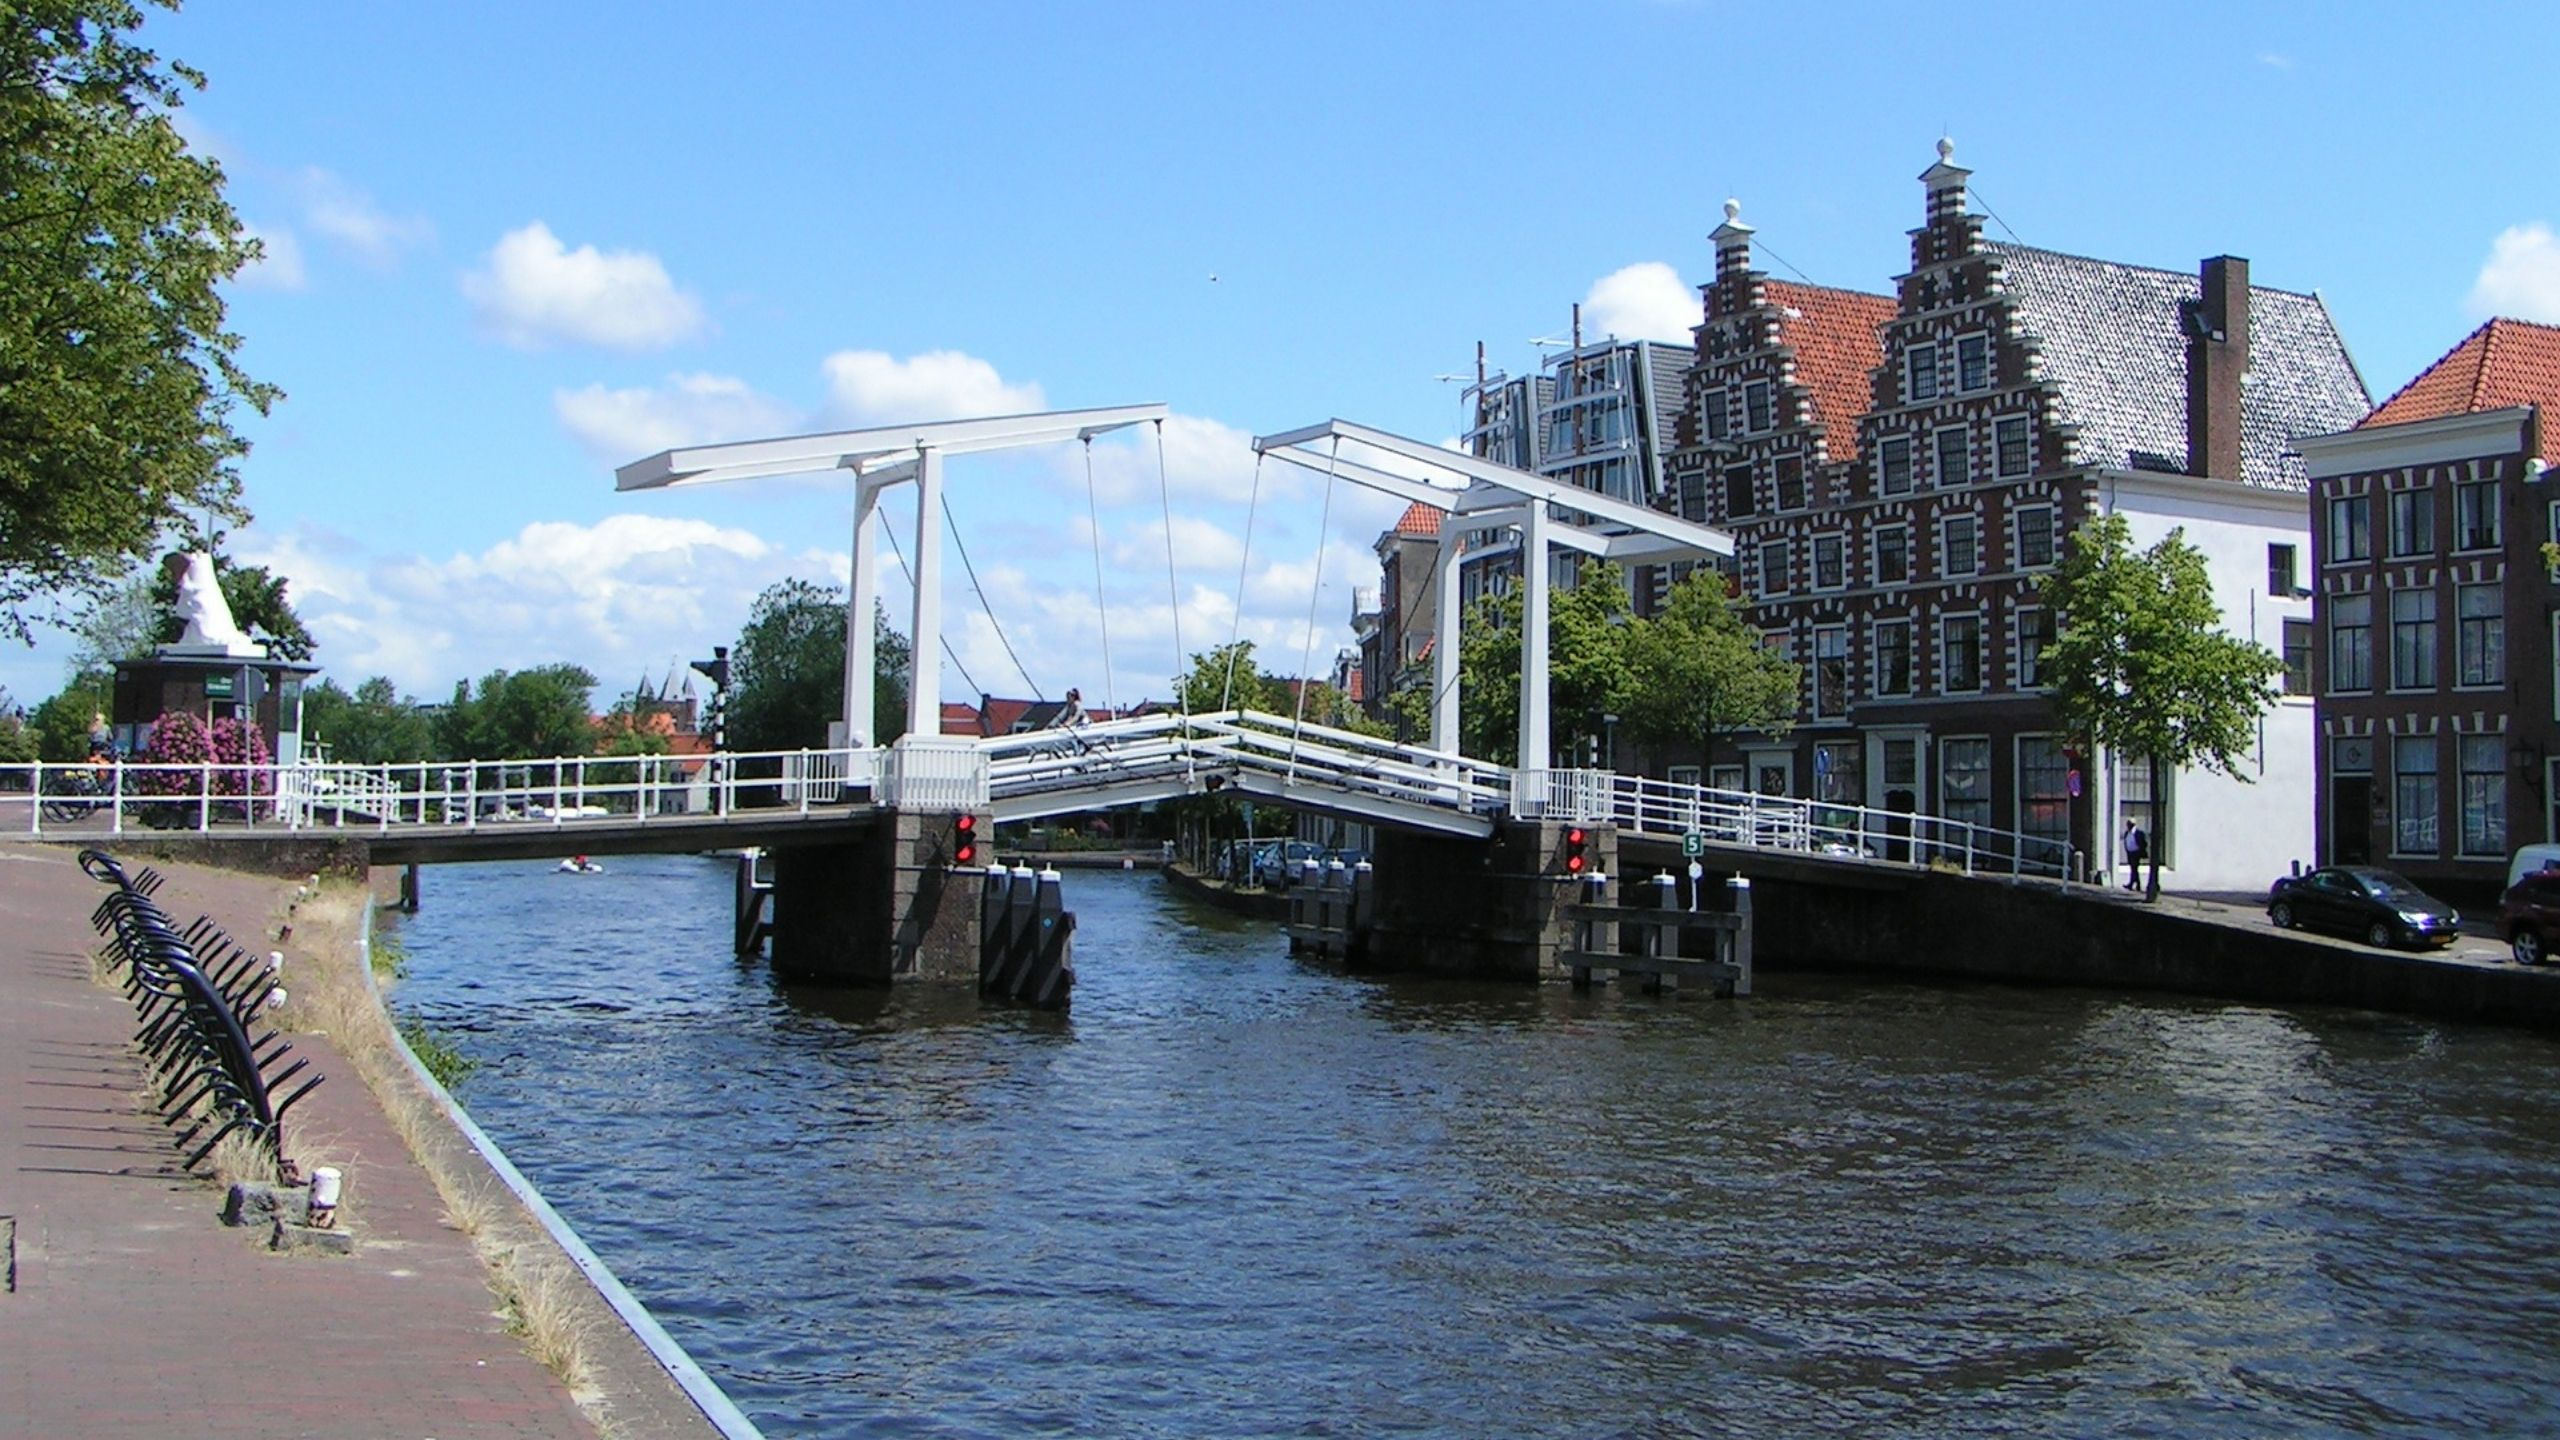 Dagtocht Rondje Noord-Holland!